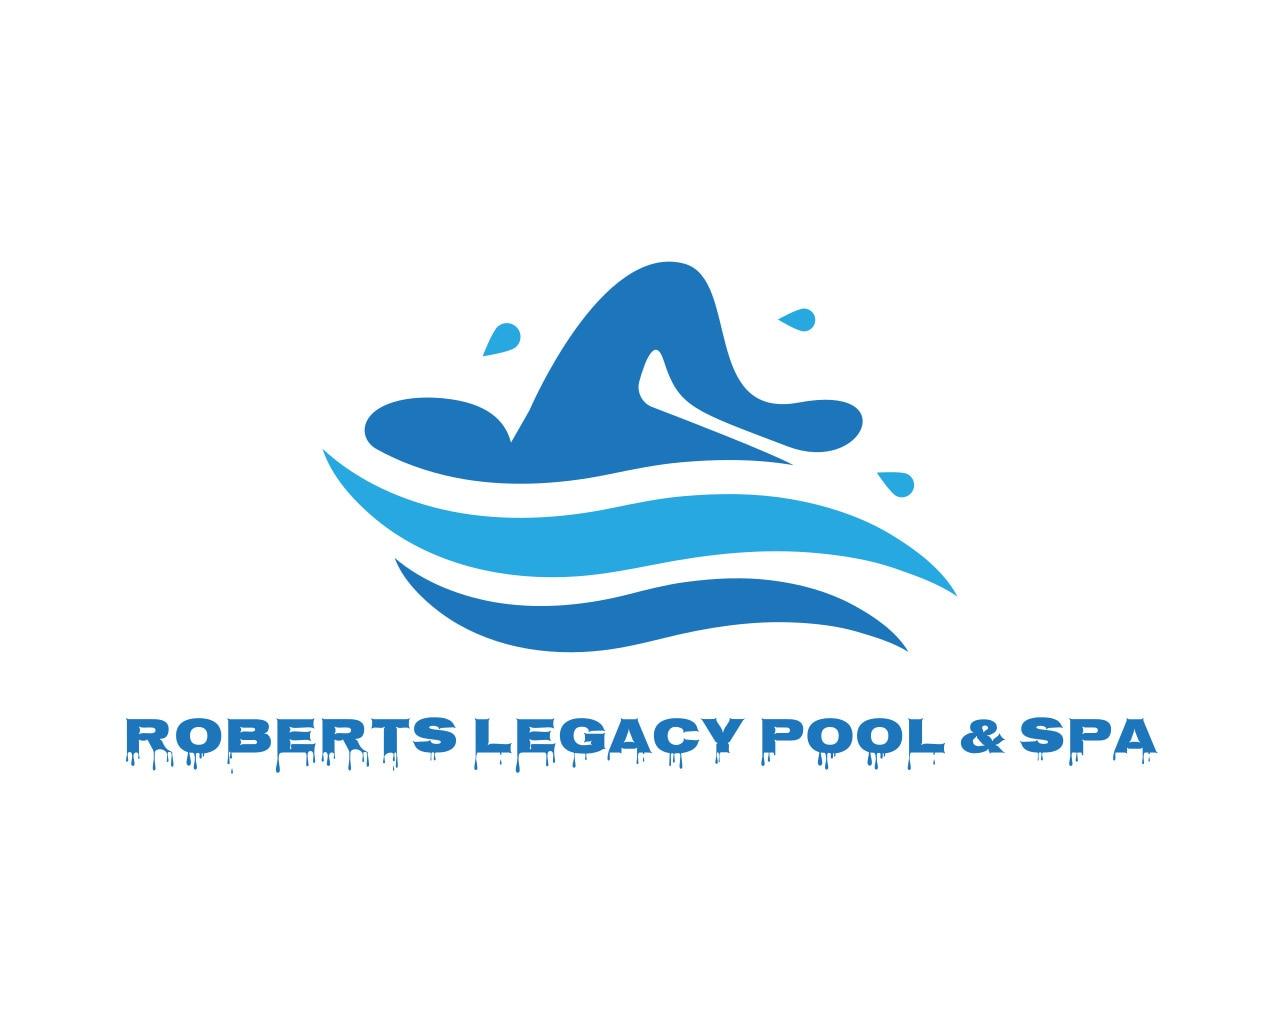 Roberts Legacy Pool & Spa, LLC